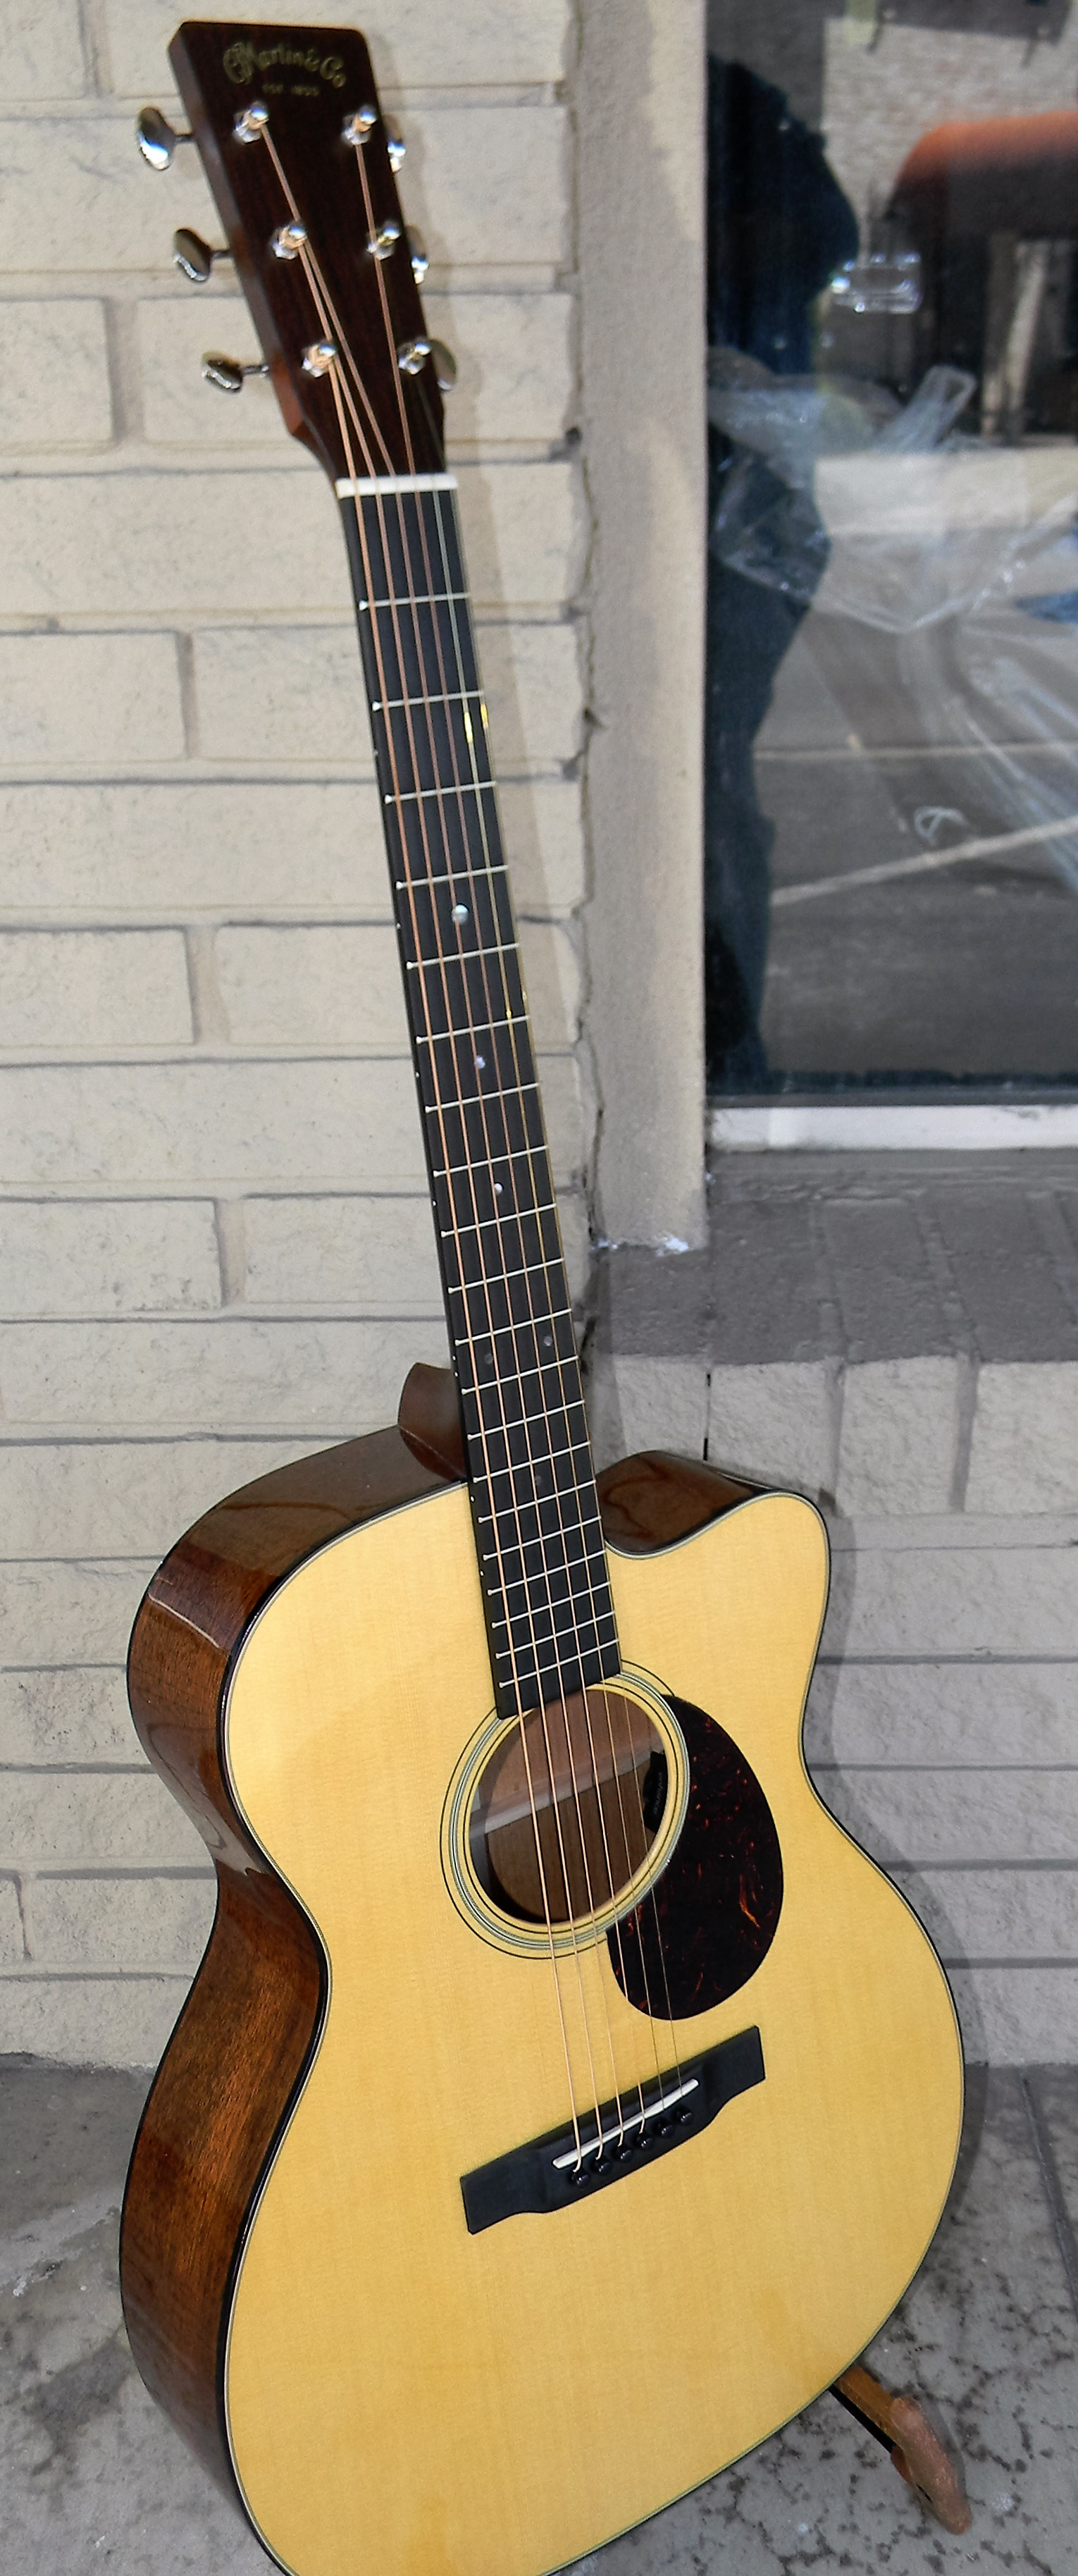 dscn4080 san antonio guitar store guitar tex. Black Bedroom Furniture Sets. Home Design Ideas